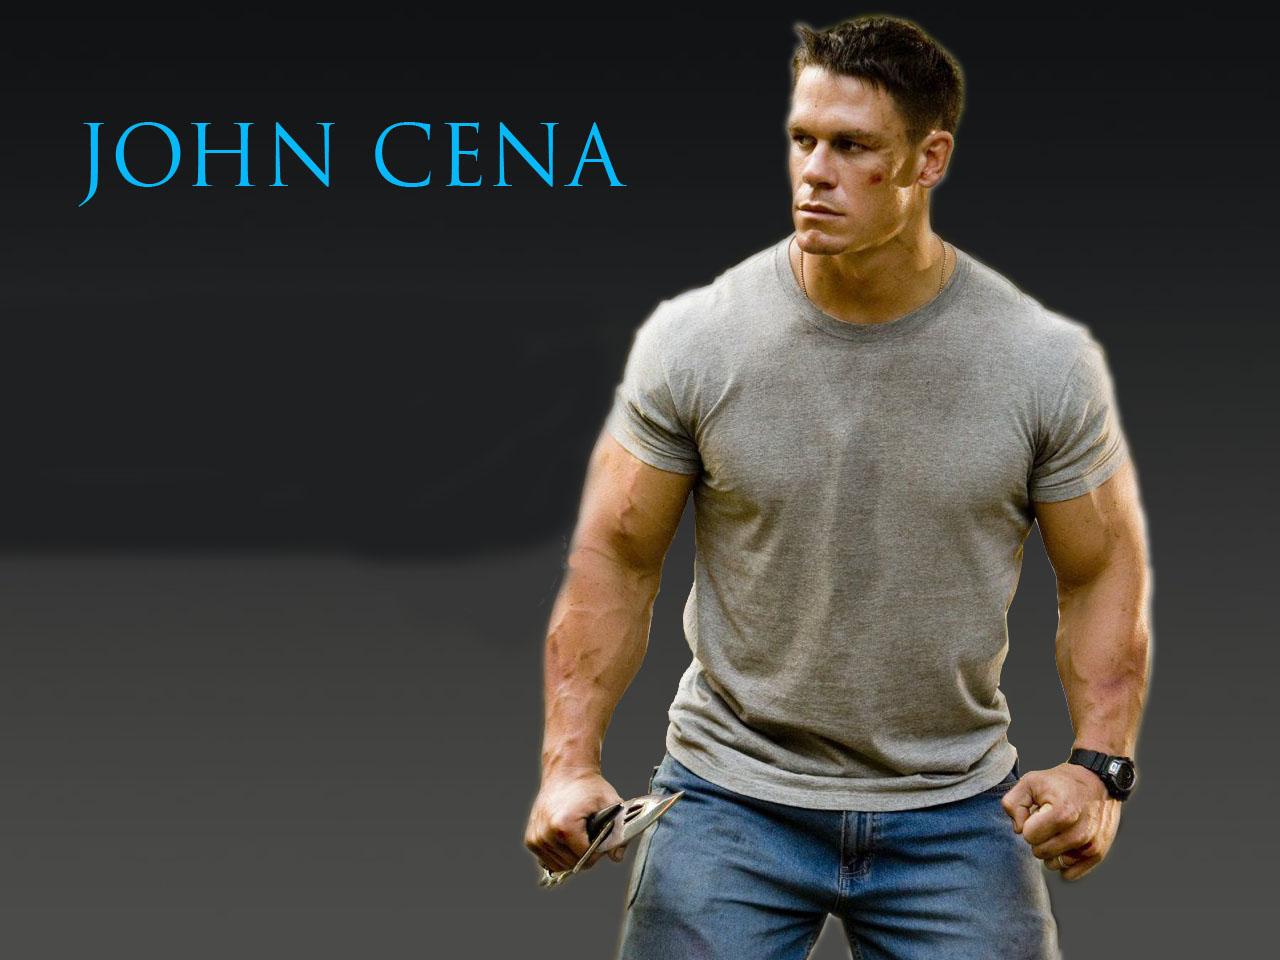 john cena wwe fresh hd wallpapers 2013 all wrestling